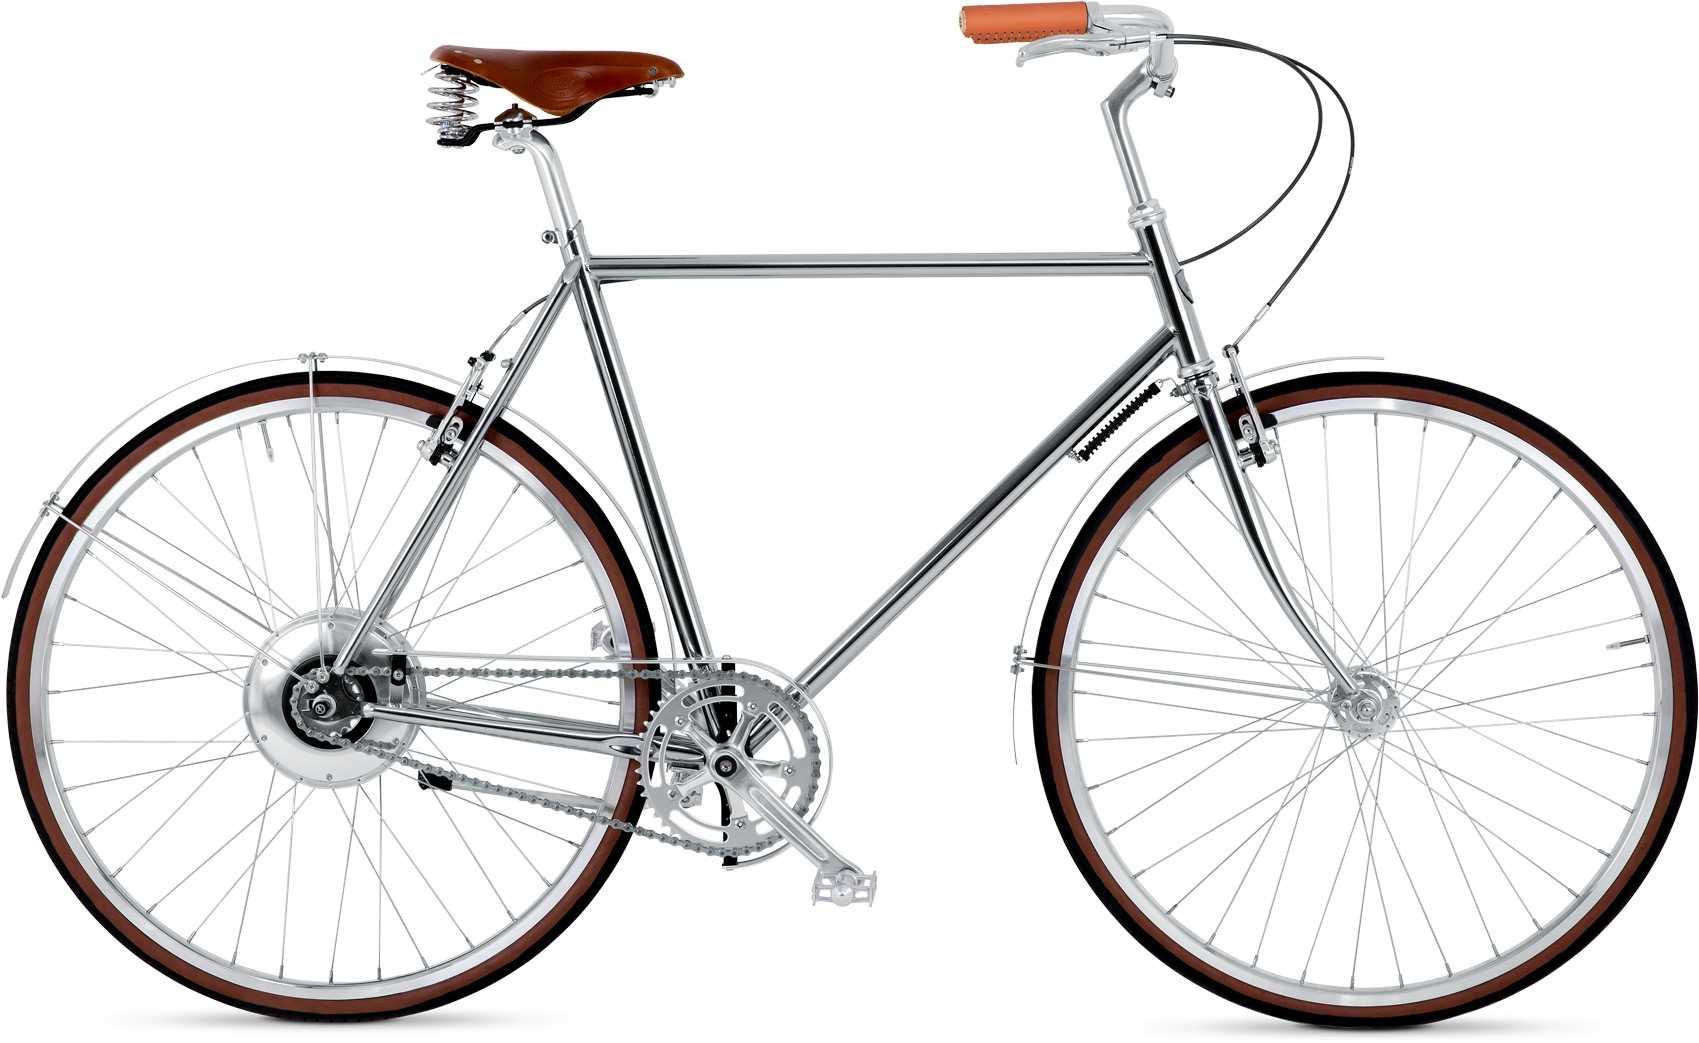 BIKEID Majestic E krom | City-cykler